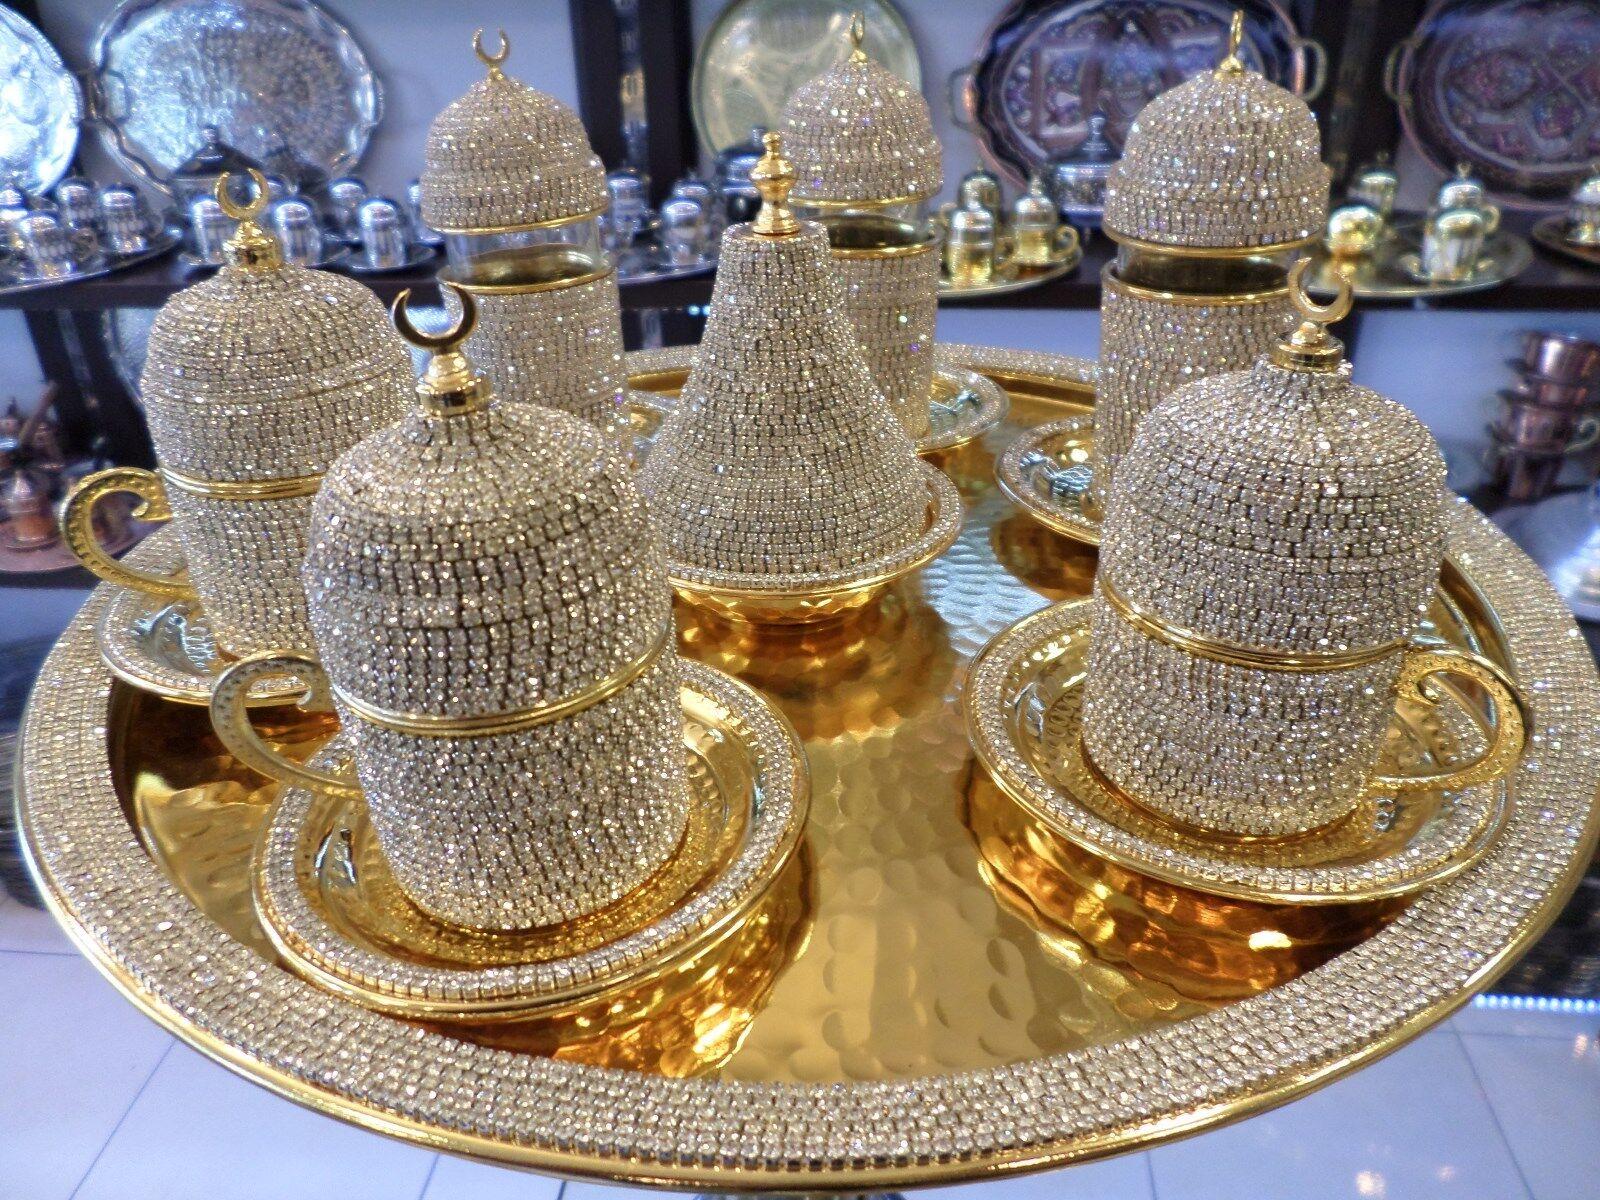 Handmade cuivre Turc Café Expresso Thé Zamzam Serving Set Swarovski Coated